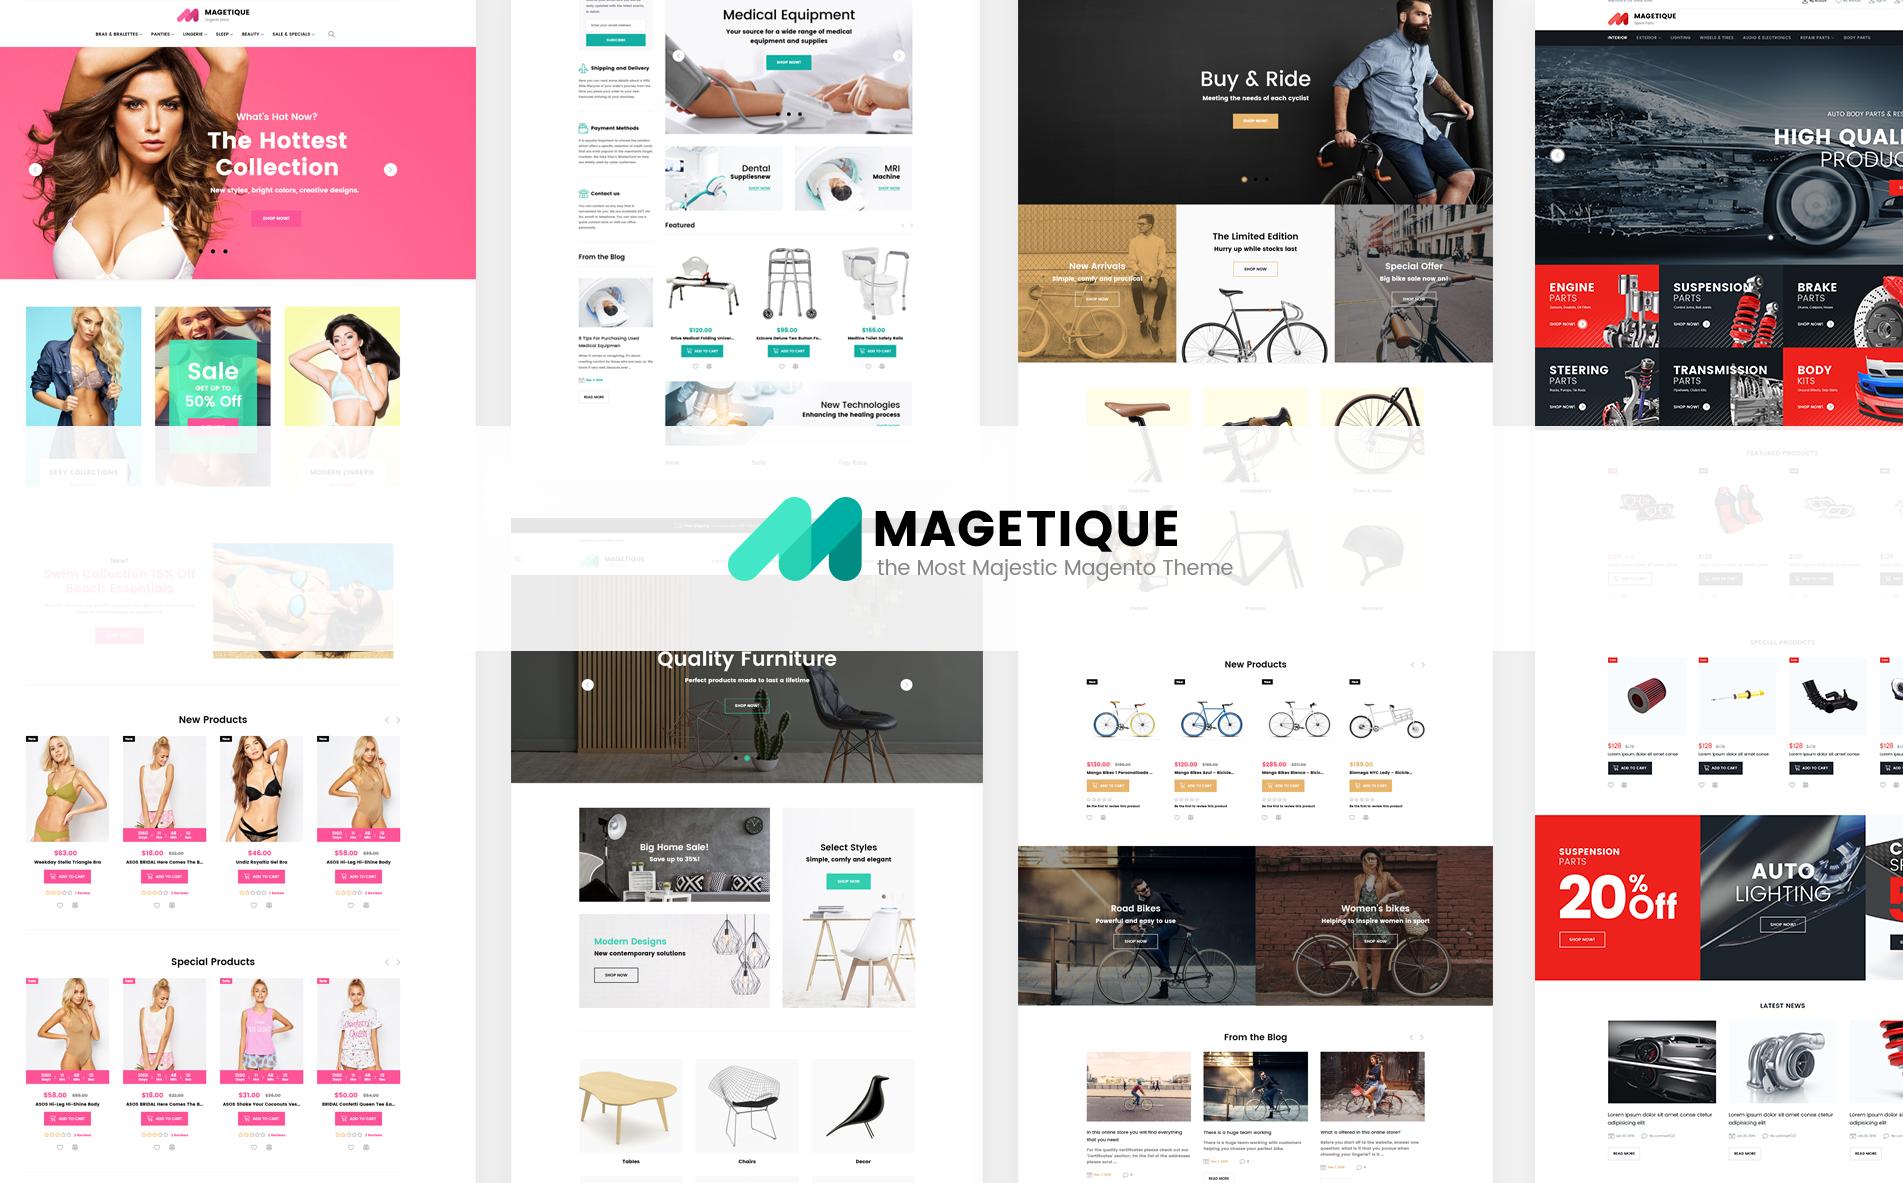 Magento 2 Themes; Magento 2 Templates